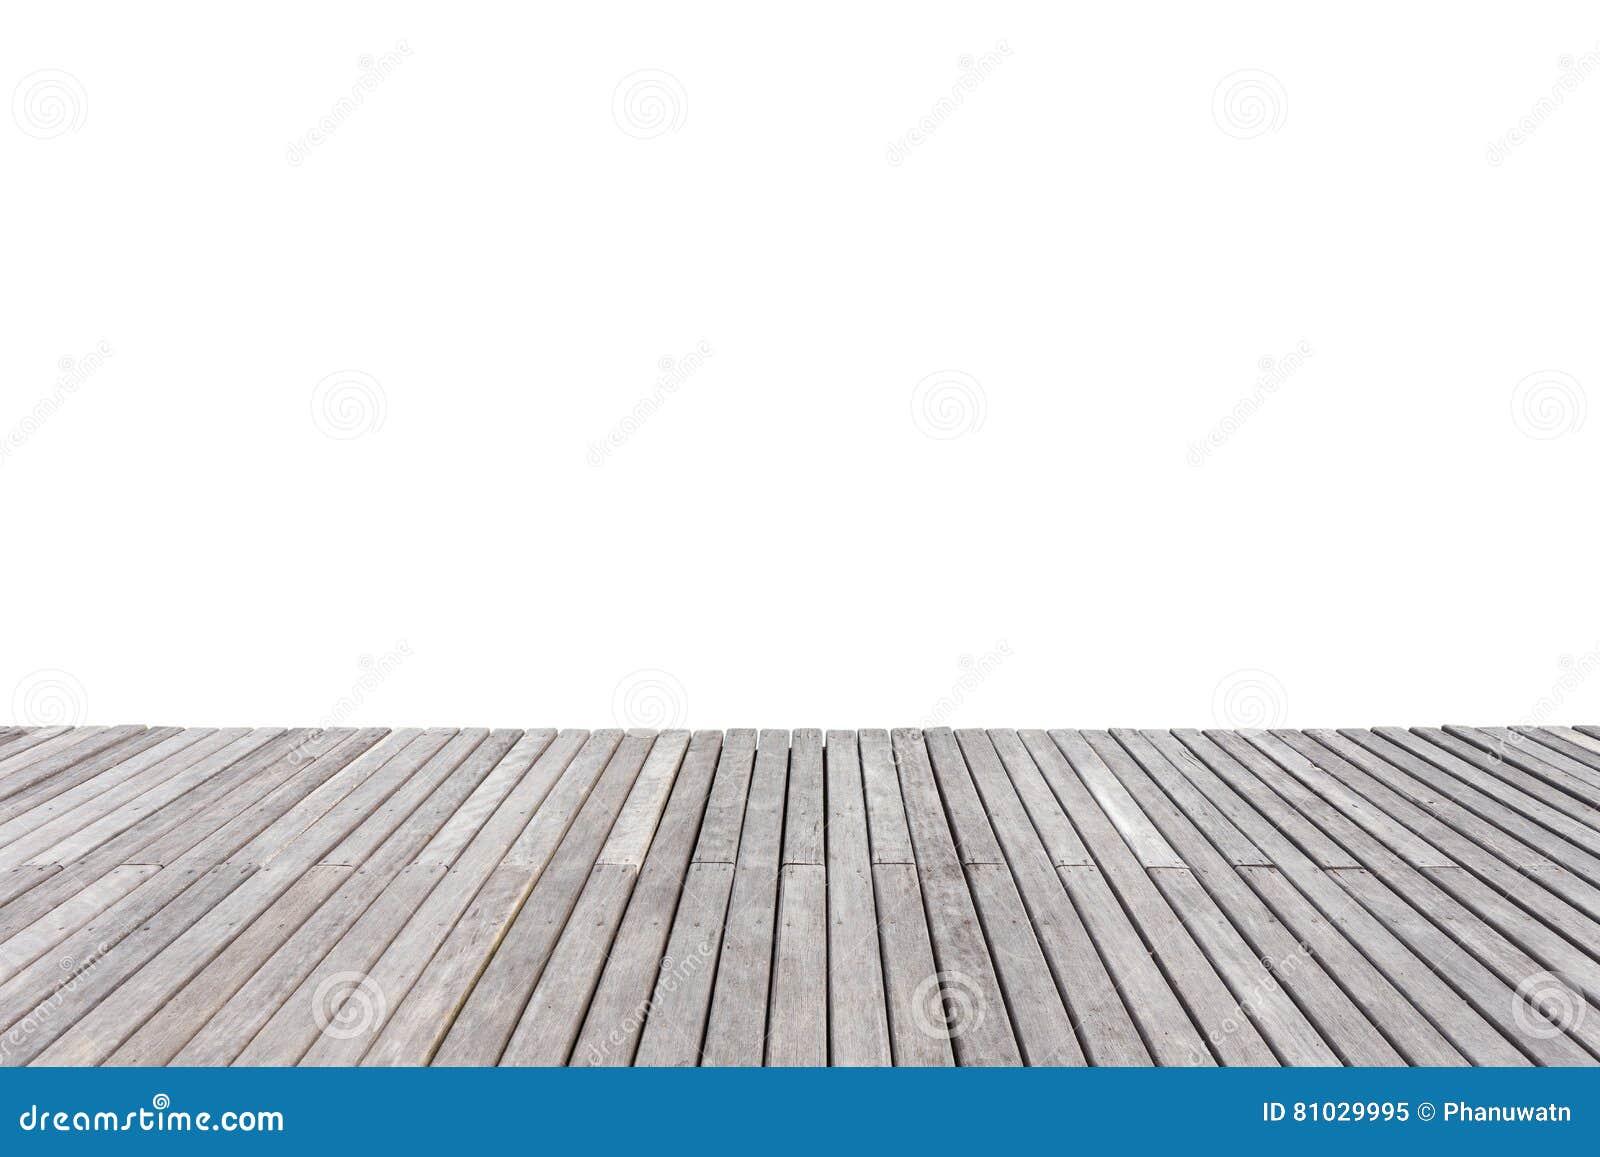 Decking o suelo de madera exterior viejo aislado en blanco salvado